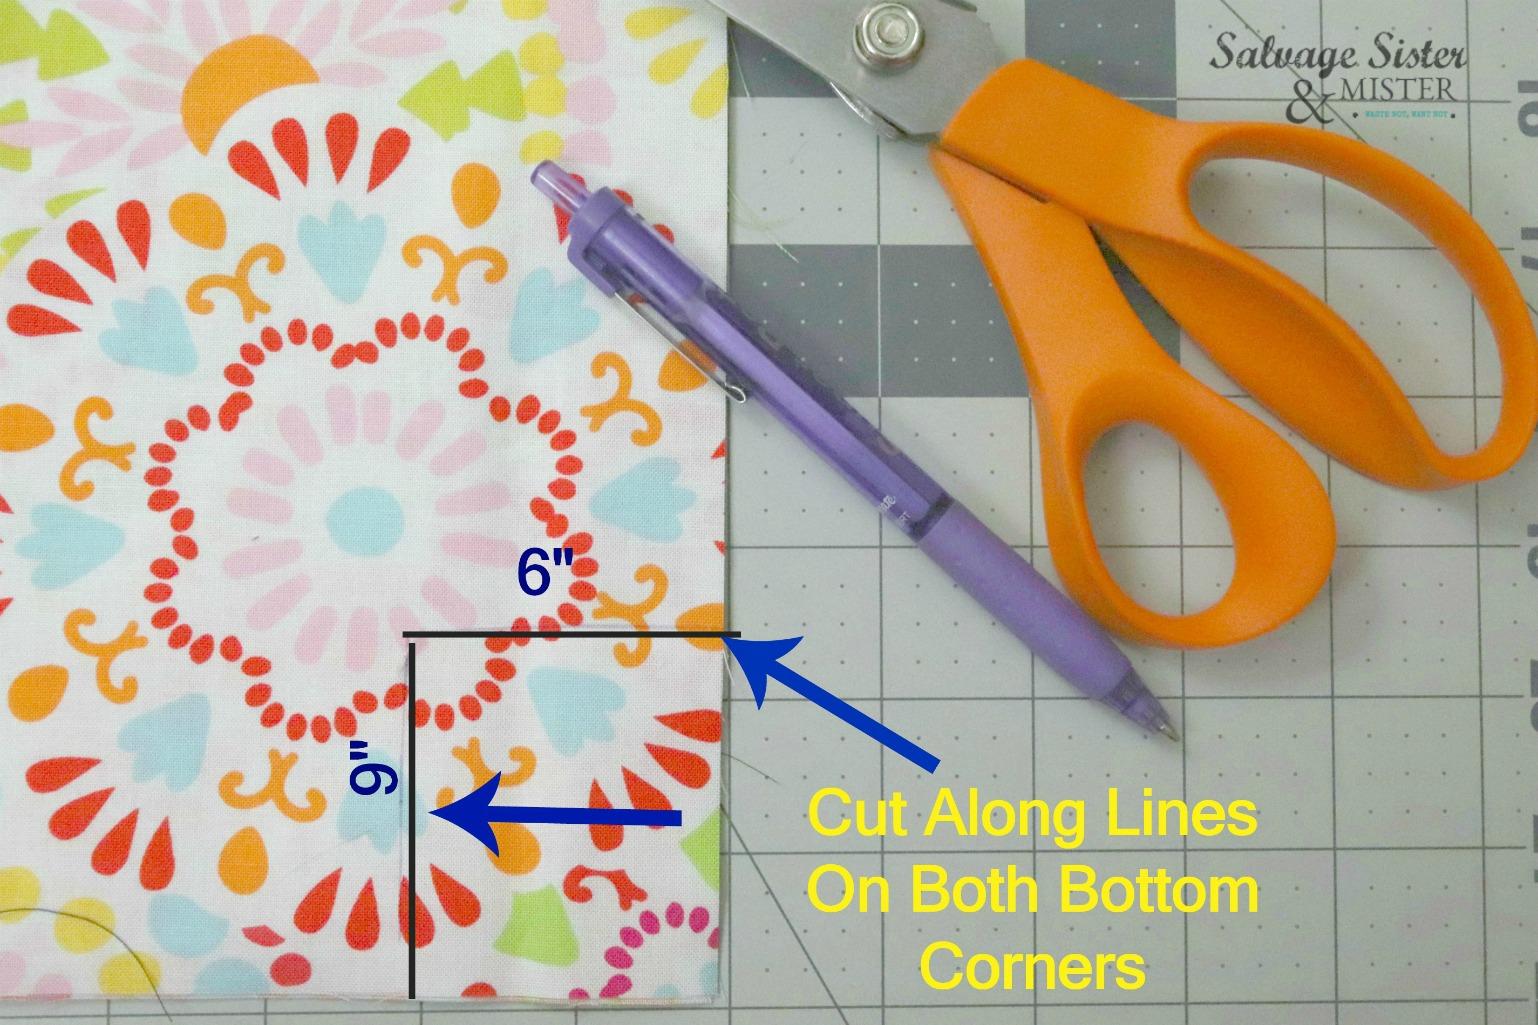 sewing tutorial on salvagesisterandmister.com